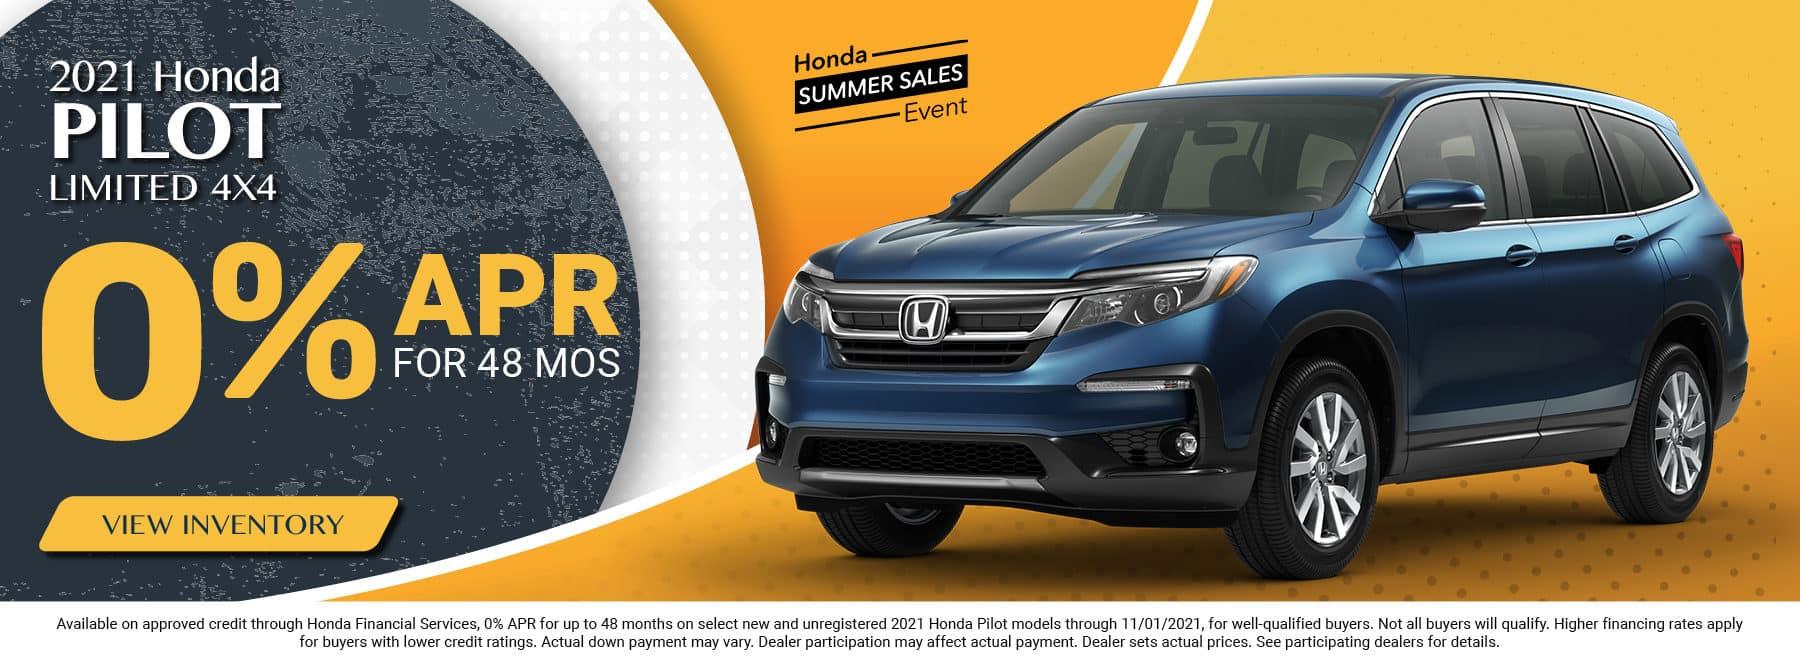 2021 Honda Pilot - 0.9% for 60 months